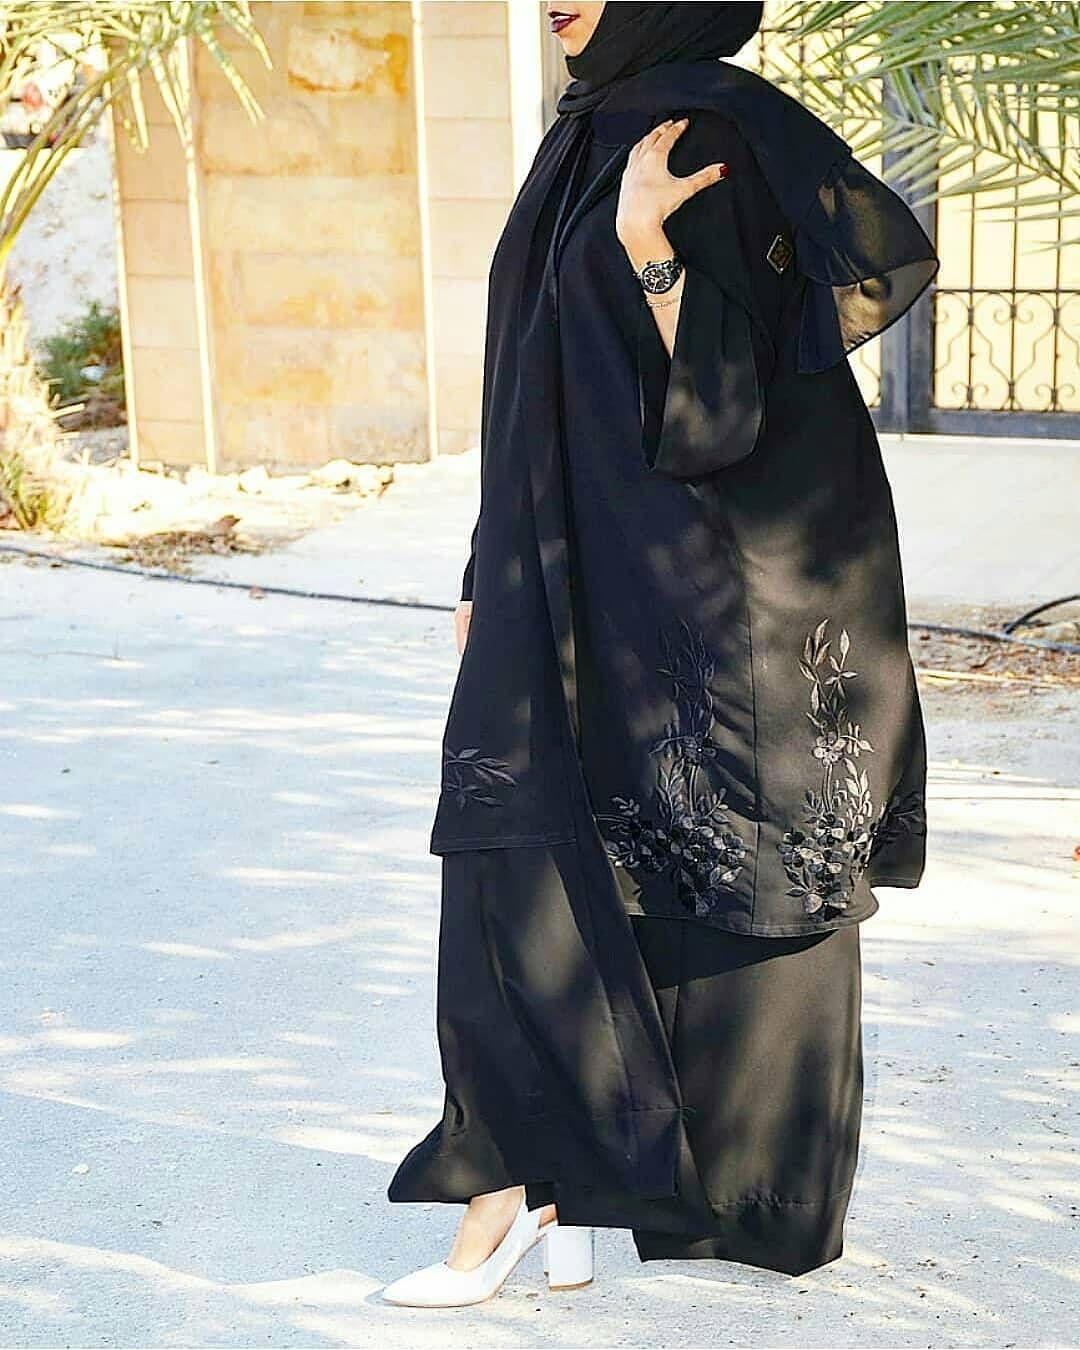 Repost Alzain Abaya With Instatoolsapp New Collection الكولكشن الجديد Sale Price 35 Bd Offer عبايه الطبقتين بتطريز اسو Abaya Fashion Islamic Fashion Fashion